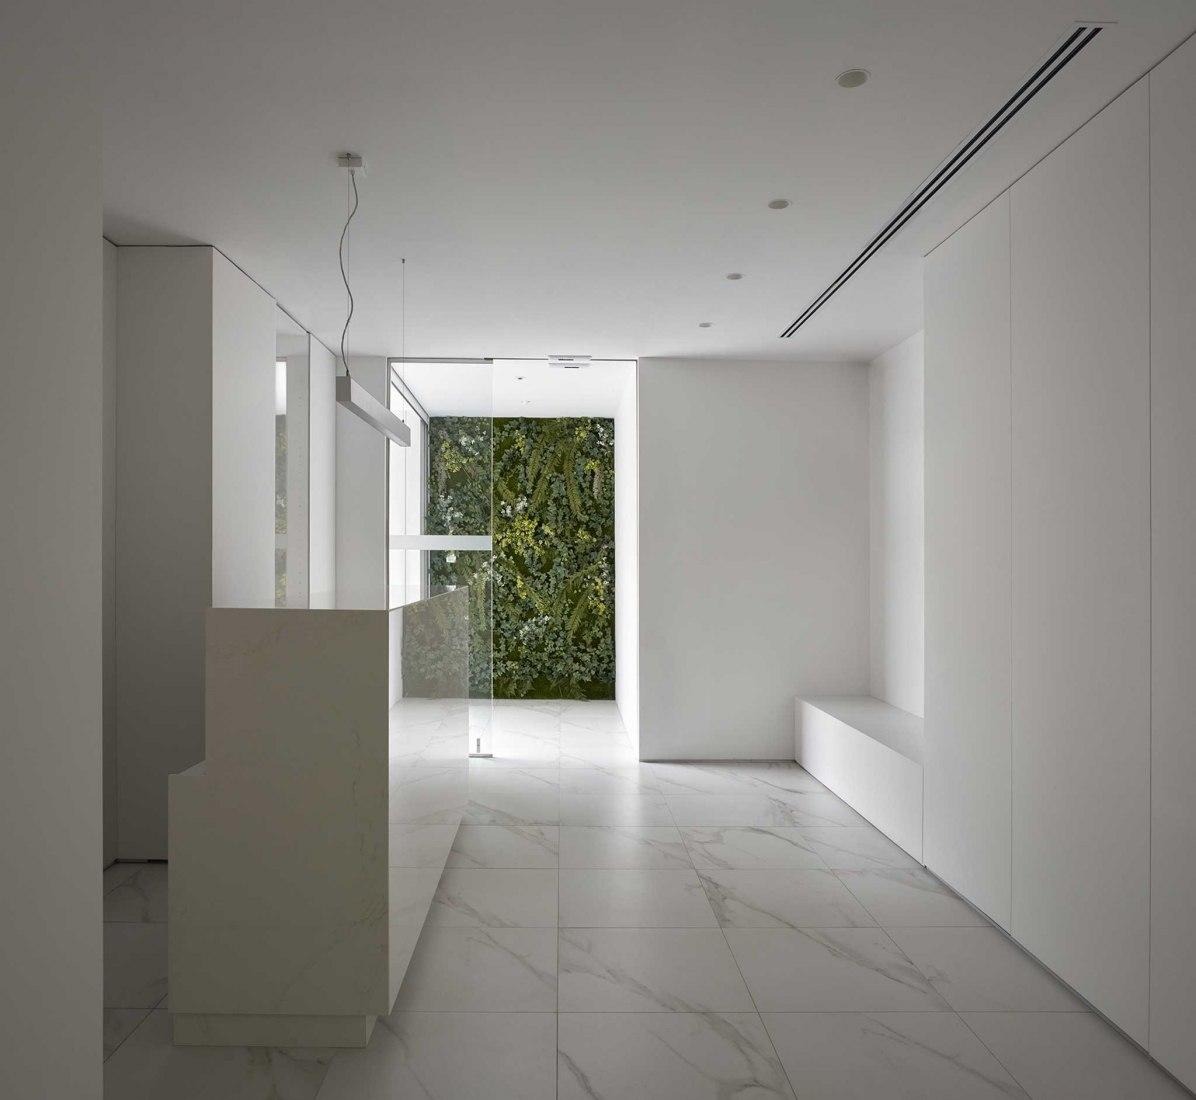 Cózar clinic by Lecoc Arquitectura and Andrés J. Cózar Lizandra. Photograph by Mariela Apollonio